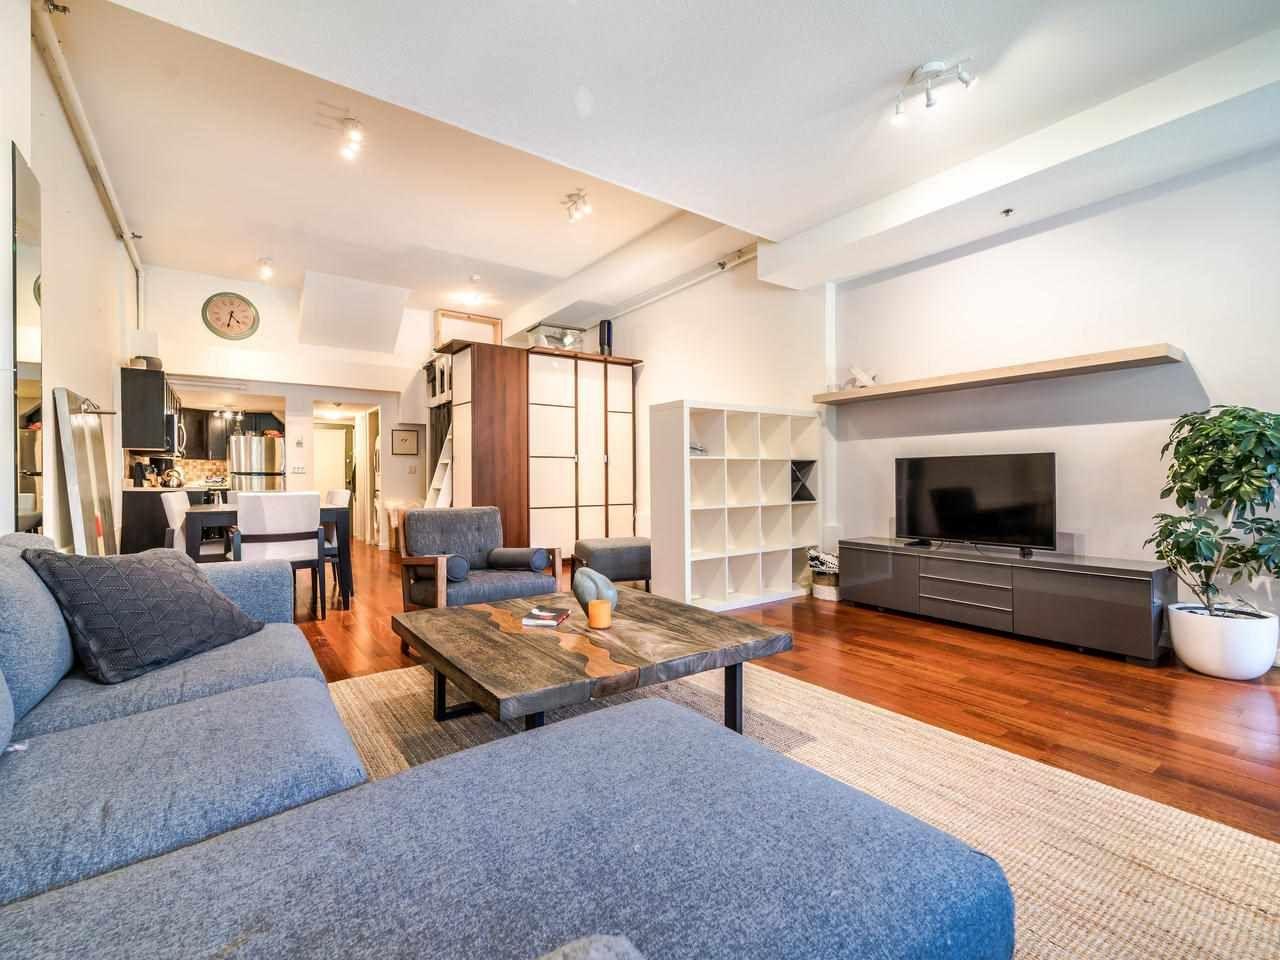 Main Photo: B3 238 E 10TH Avenue in Vancouver: Mount Pleasant VE Condo for sale (Vancouver East)  : MLS®# R2489352